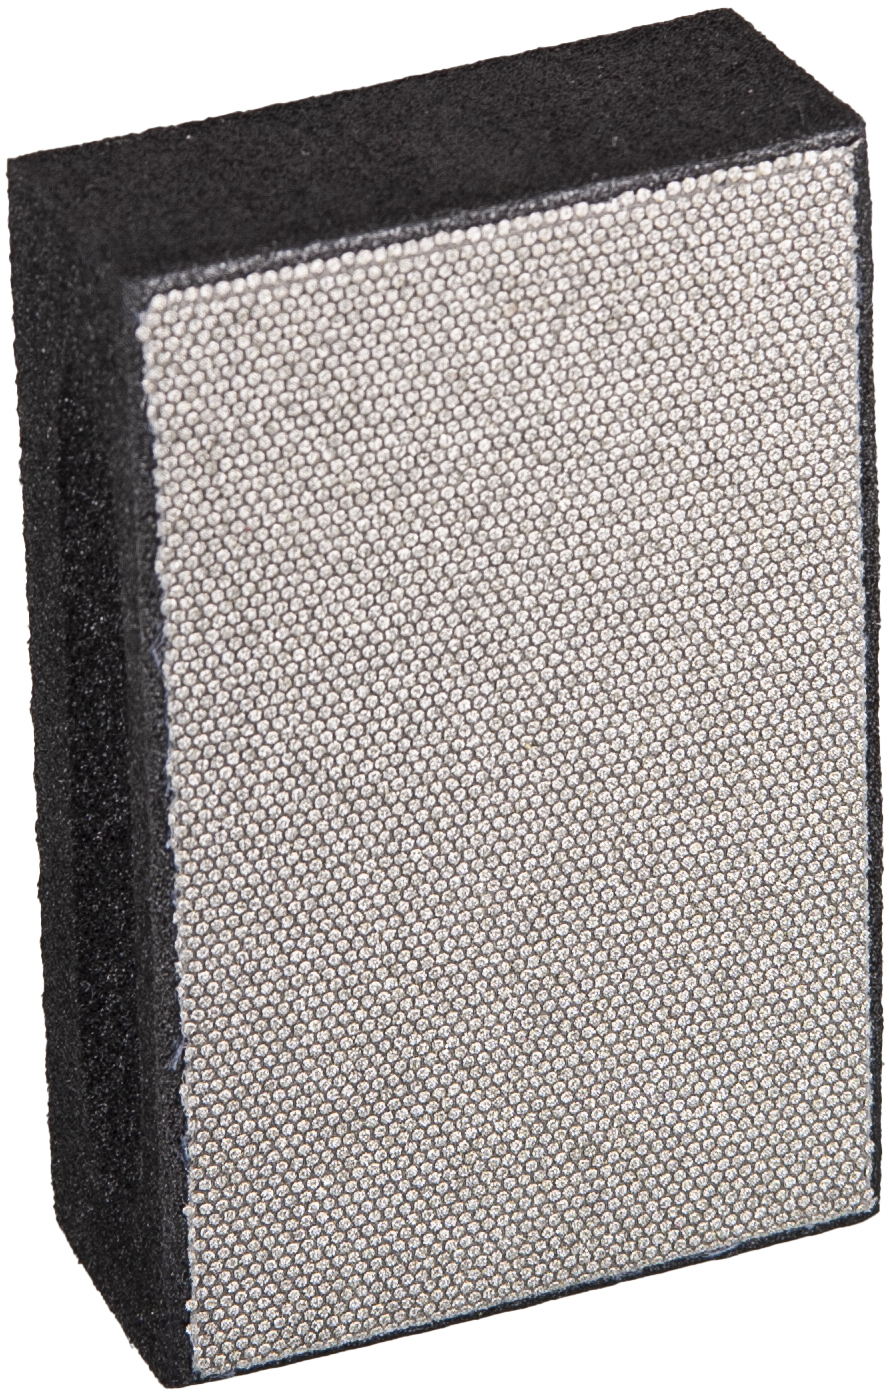 Diamant Handpad 90 x 55 mm │ Korn 120